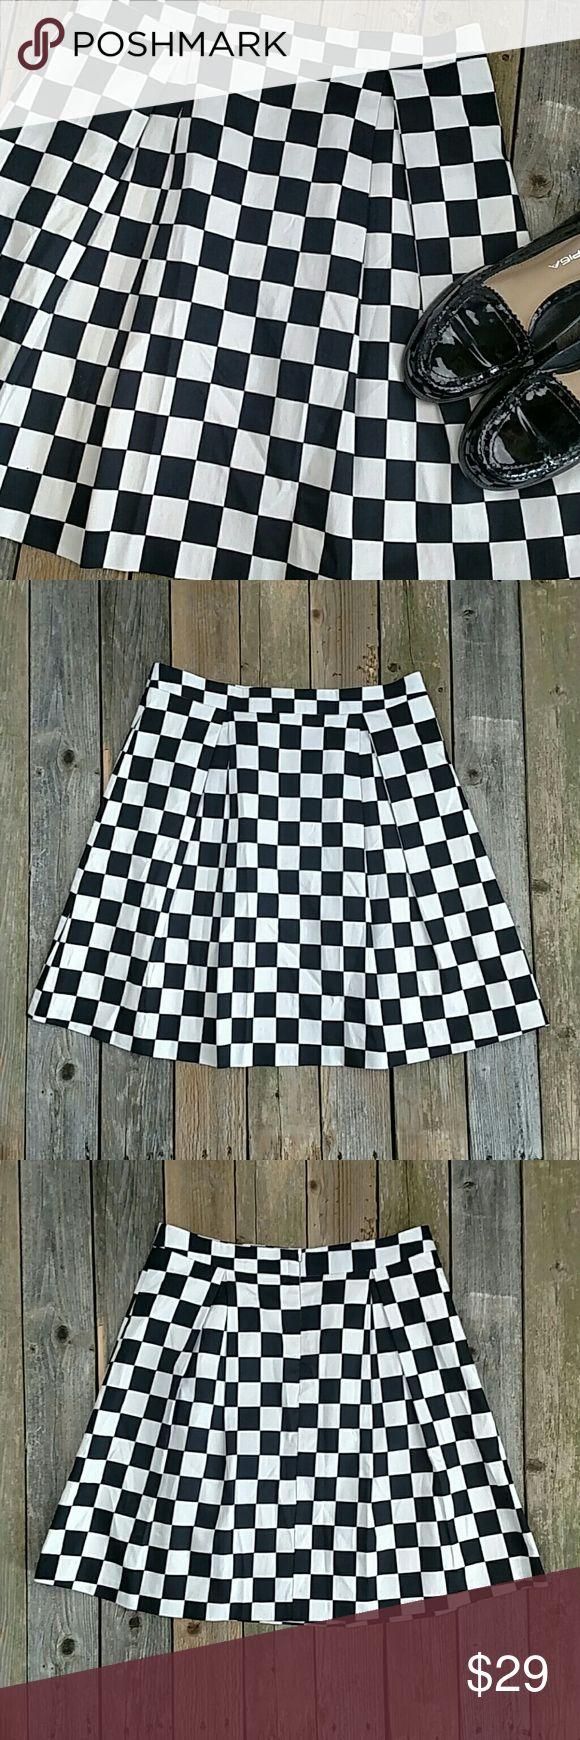 Selling this Soho Fashion Checkered Mini Skirt on Poshmark! My username is: shann12189. #shopmycloset #poshmark #fashion #shopping #style #forsale #SOHO Fashion #Dresses & Skirts